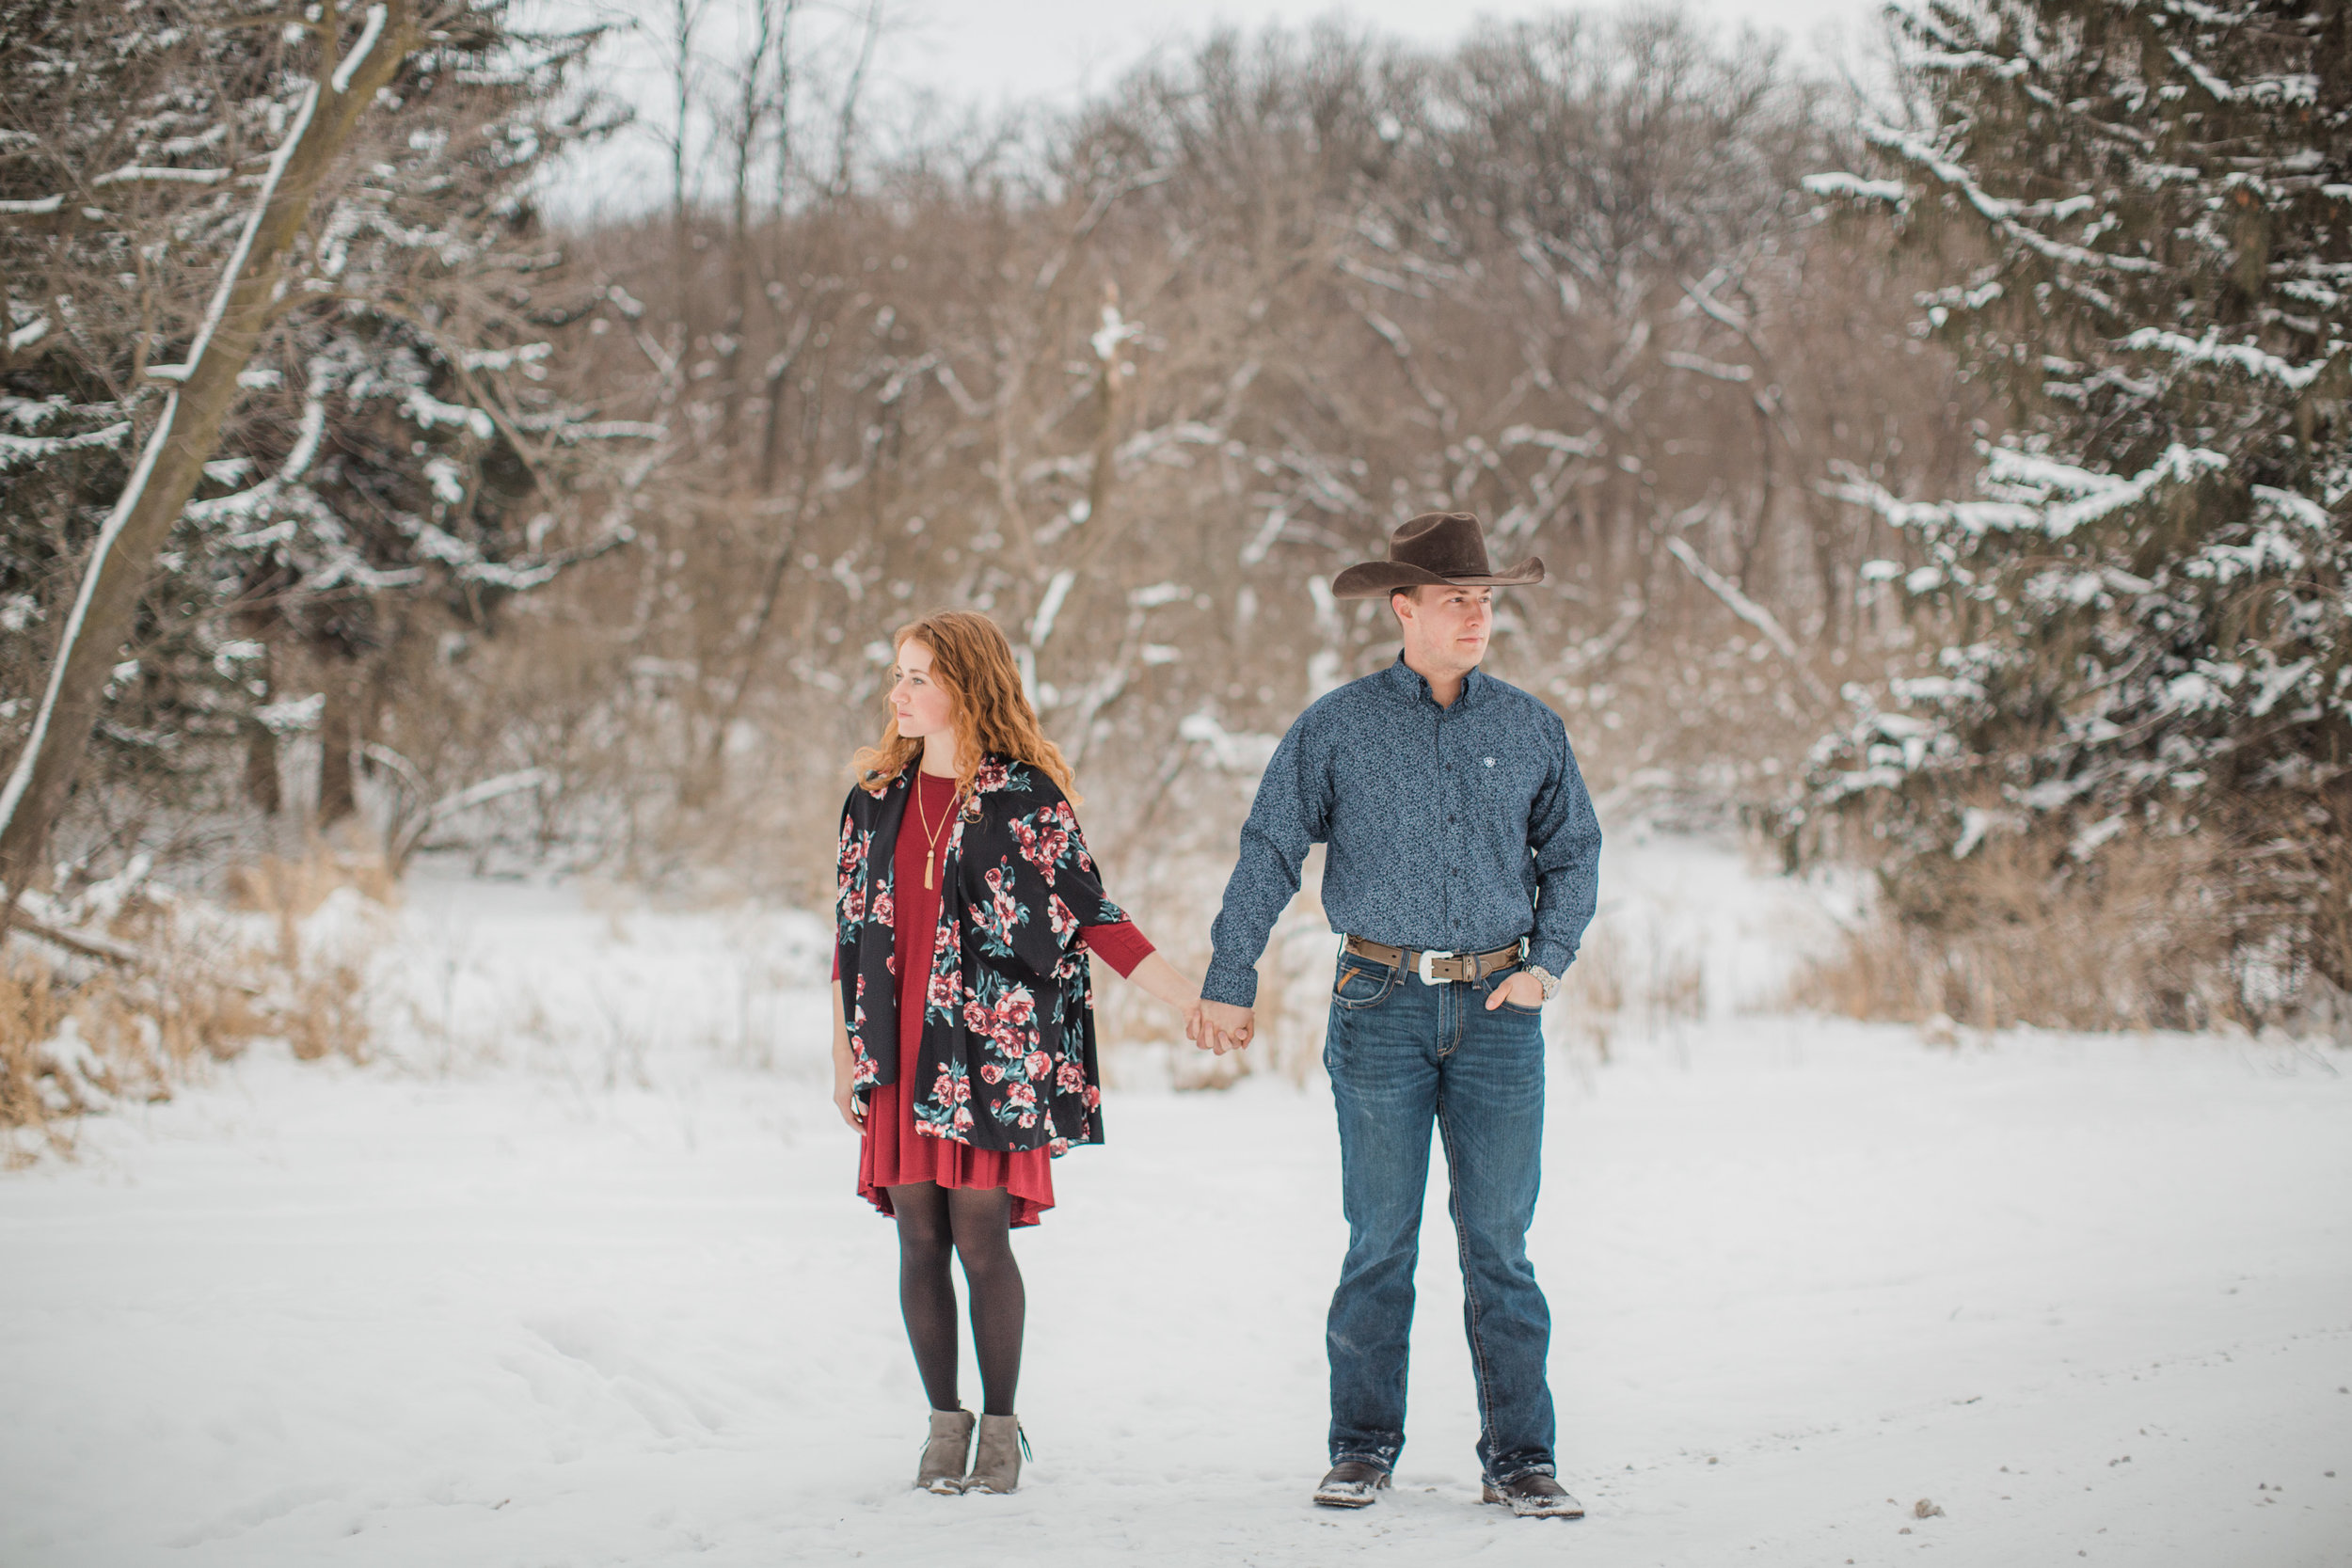 artistic wedding photographers des mOines iowa winter engagement pictures